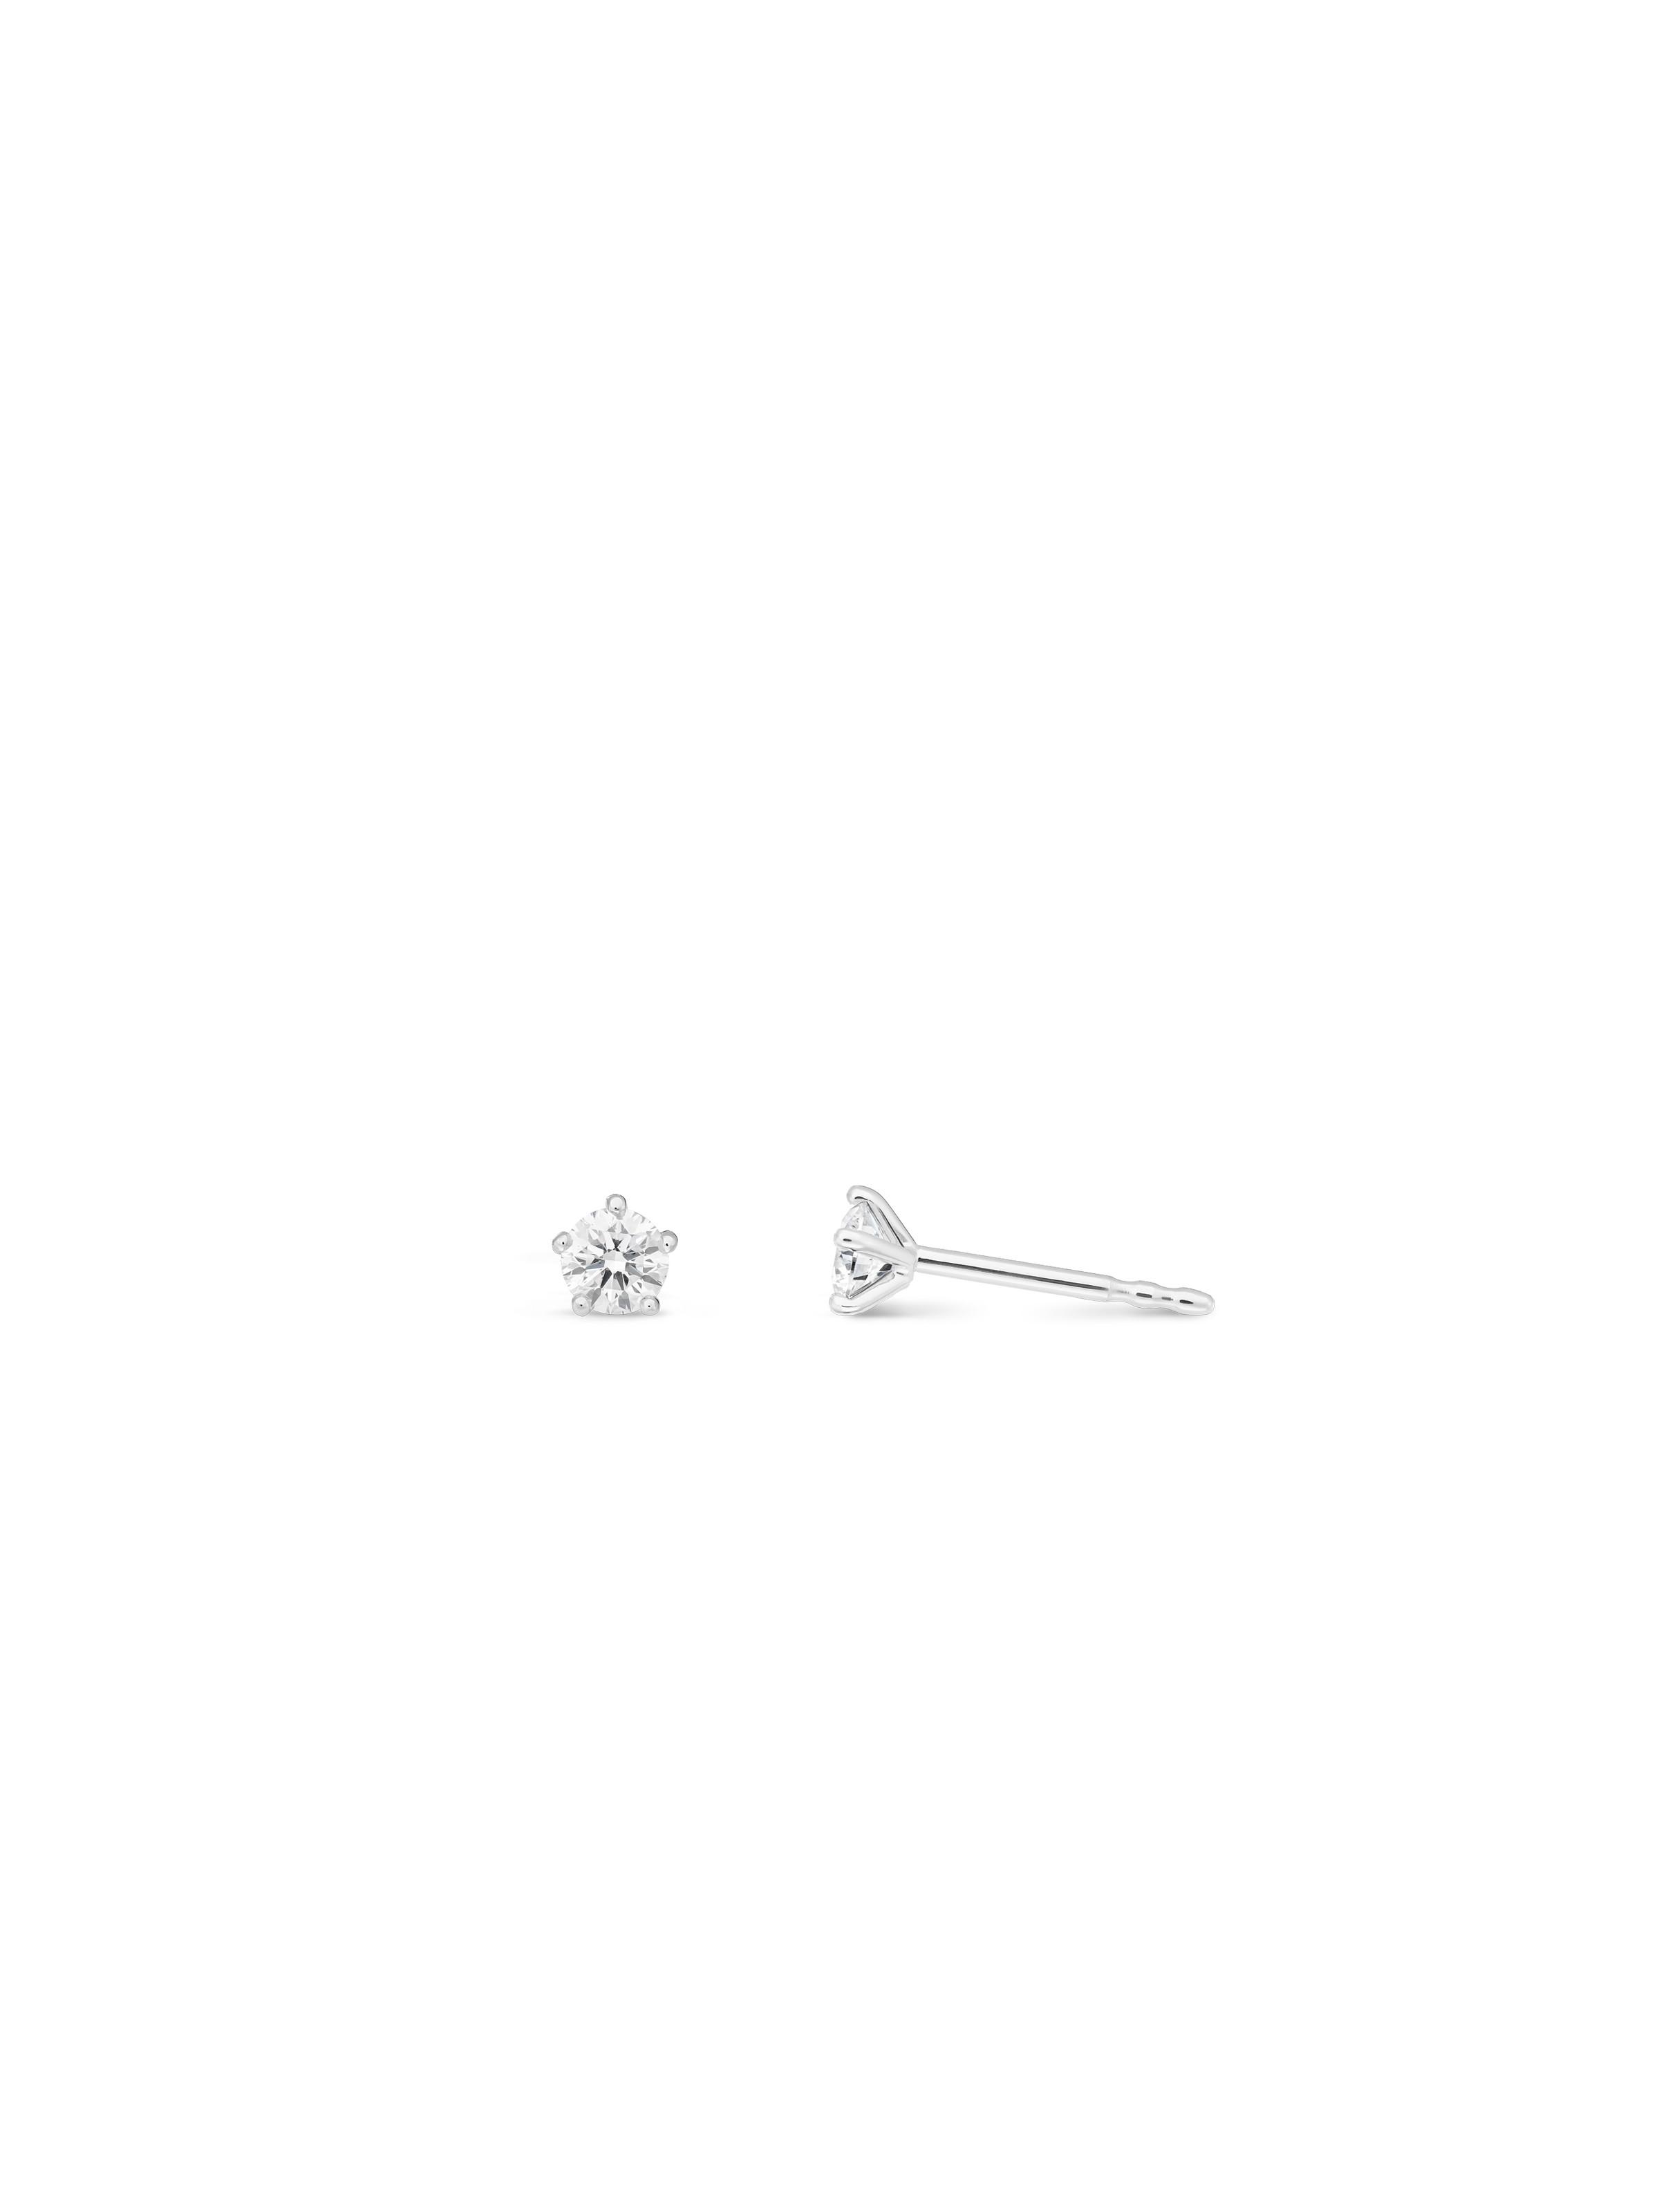 One Renaissance earrings